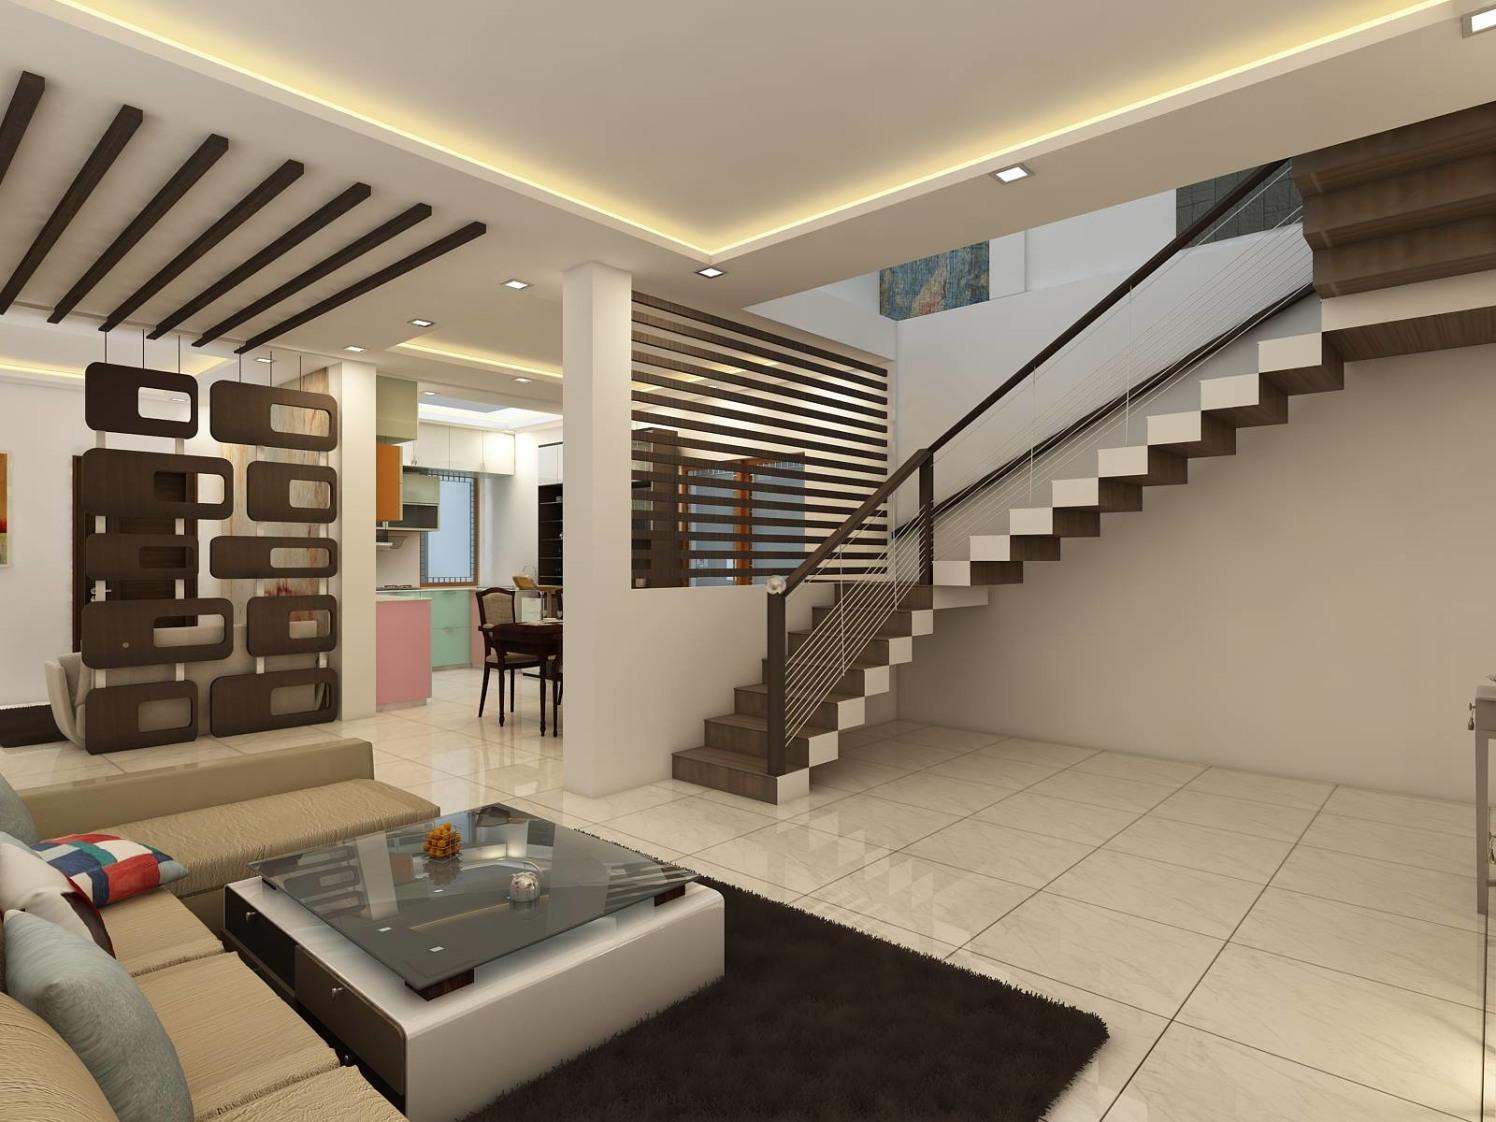 Spacious Hallway with false ceiling  and stair case by Regalias Interiors Living-room Minimalistic | Interior Design Photos & Ideas